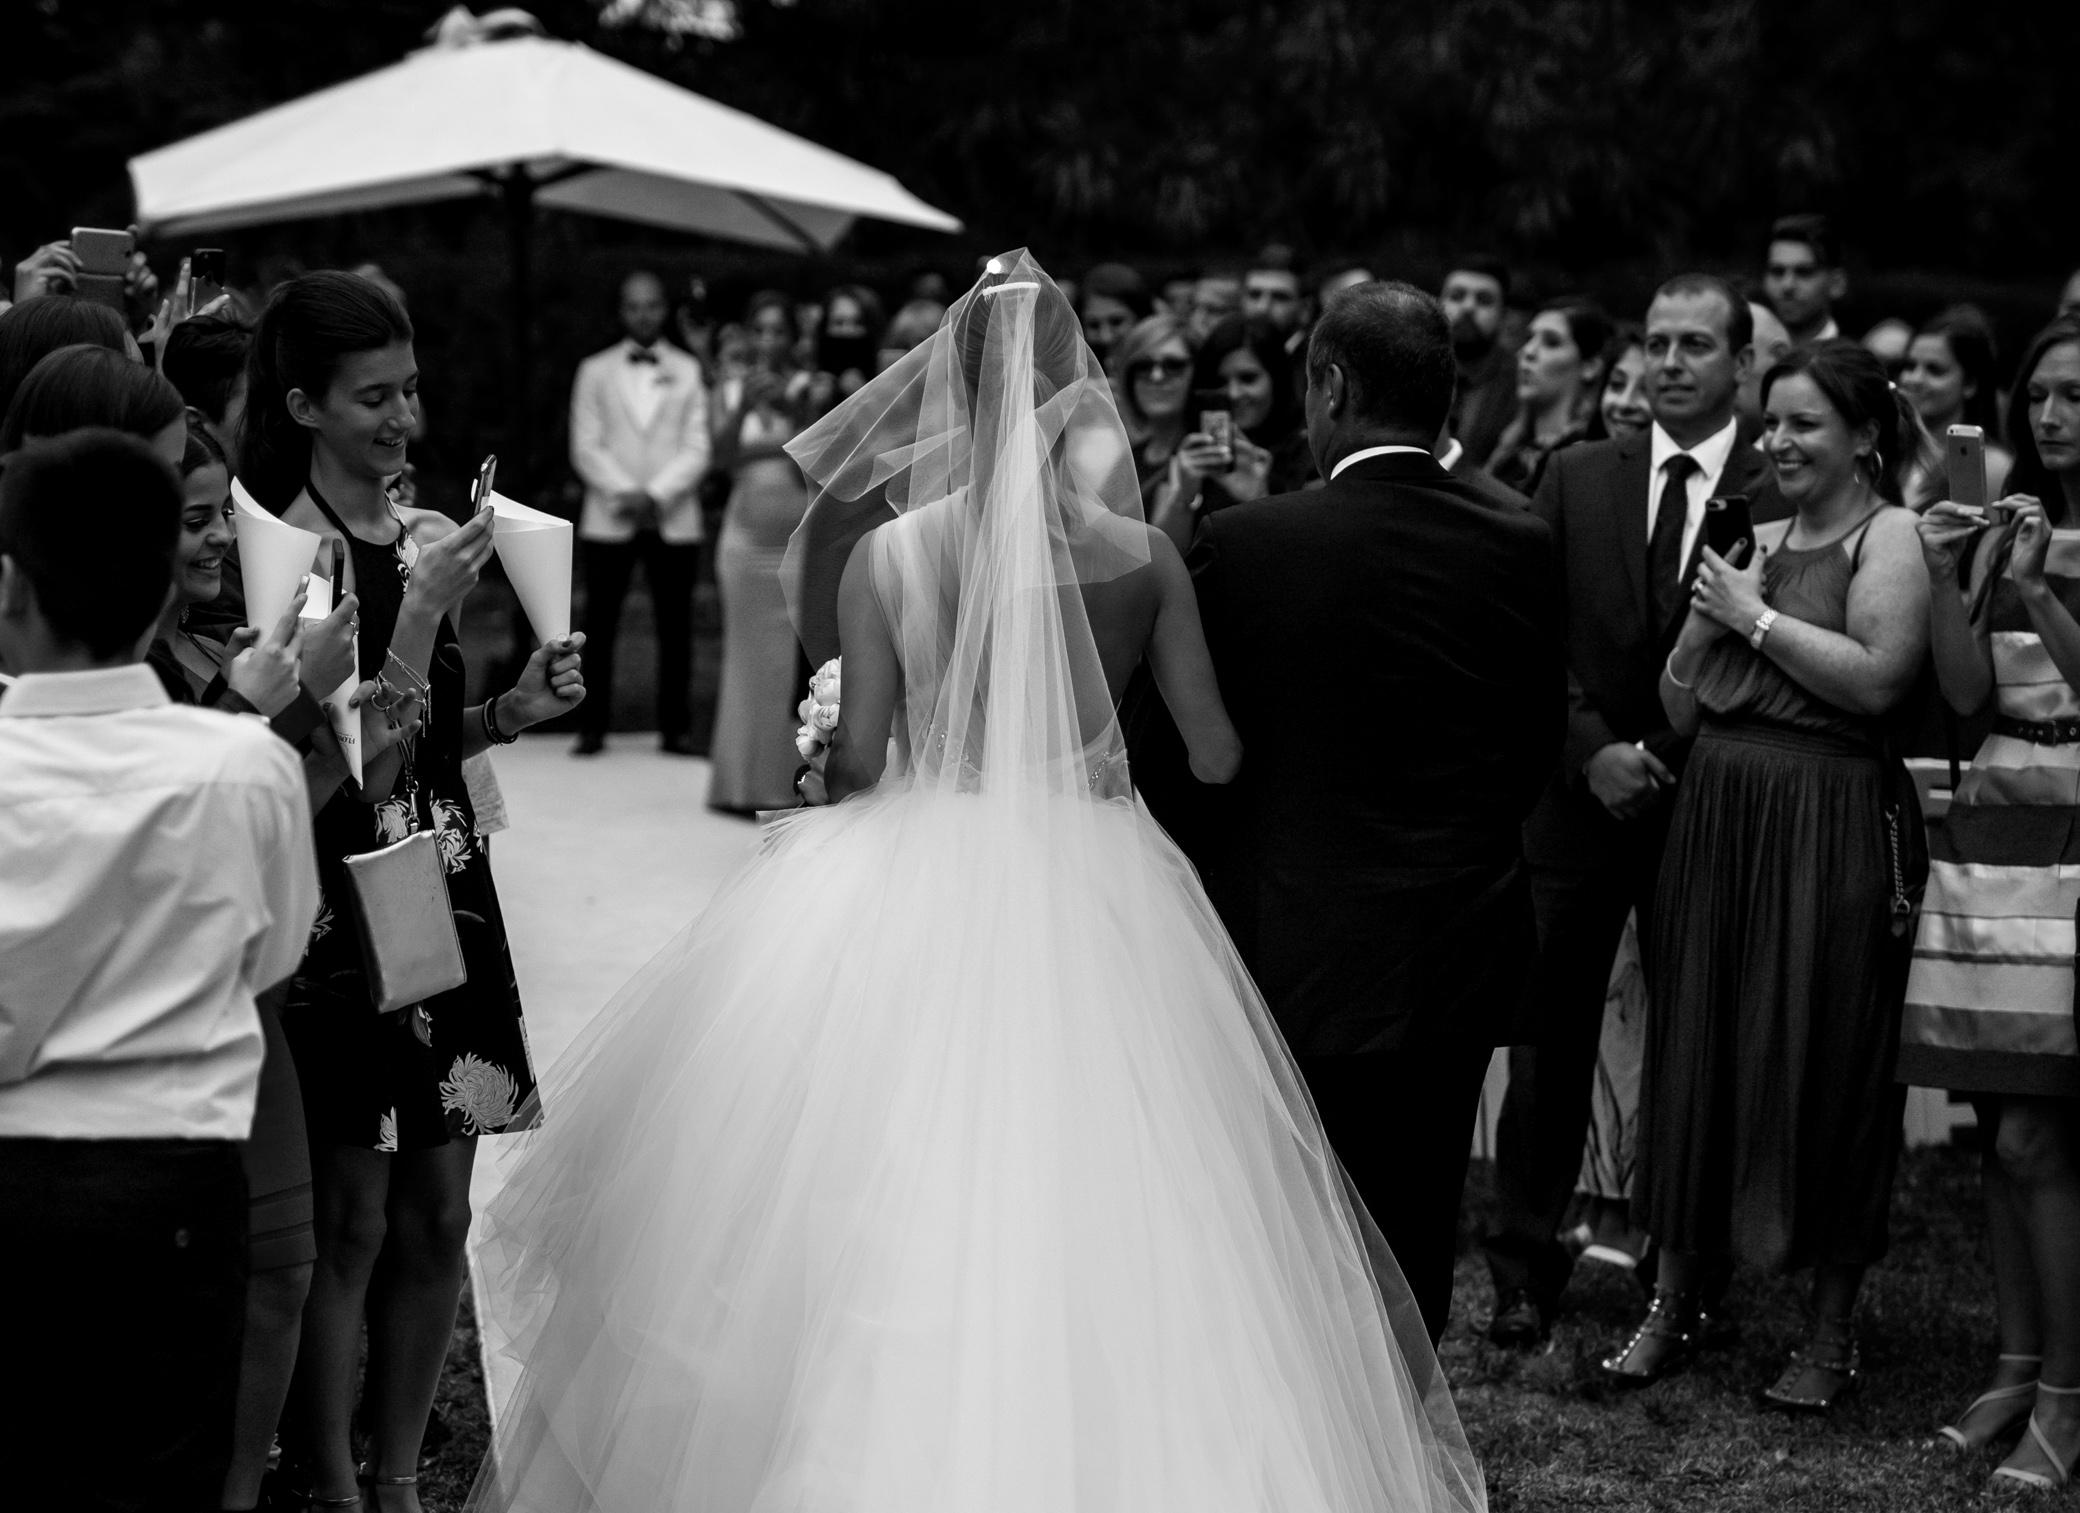 mr-theodore_white-vine-photography_same-sex-wedding-directory1.jpg